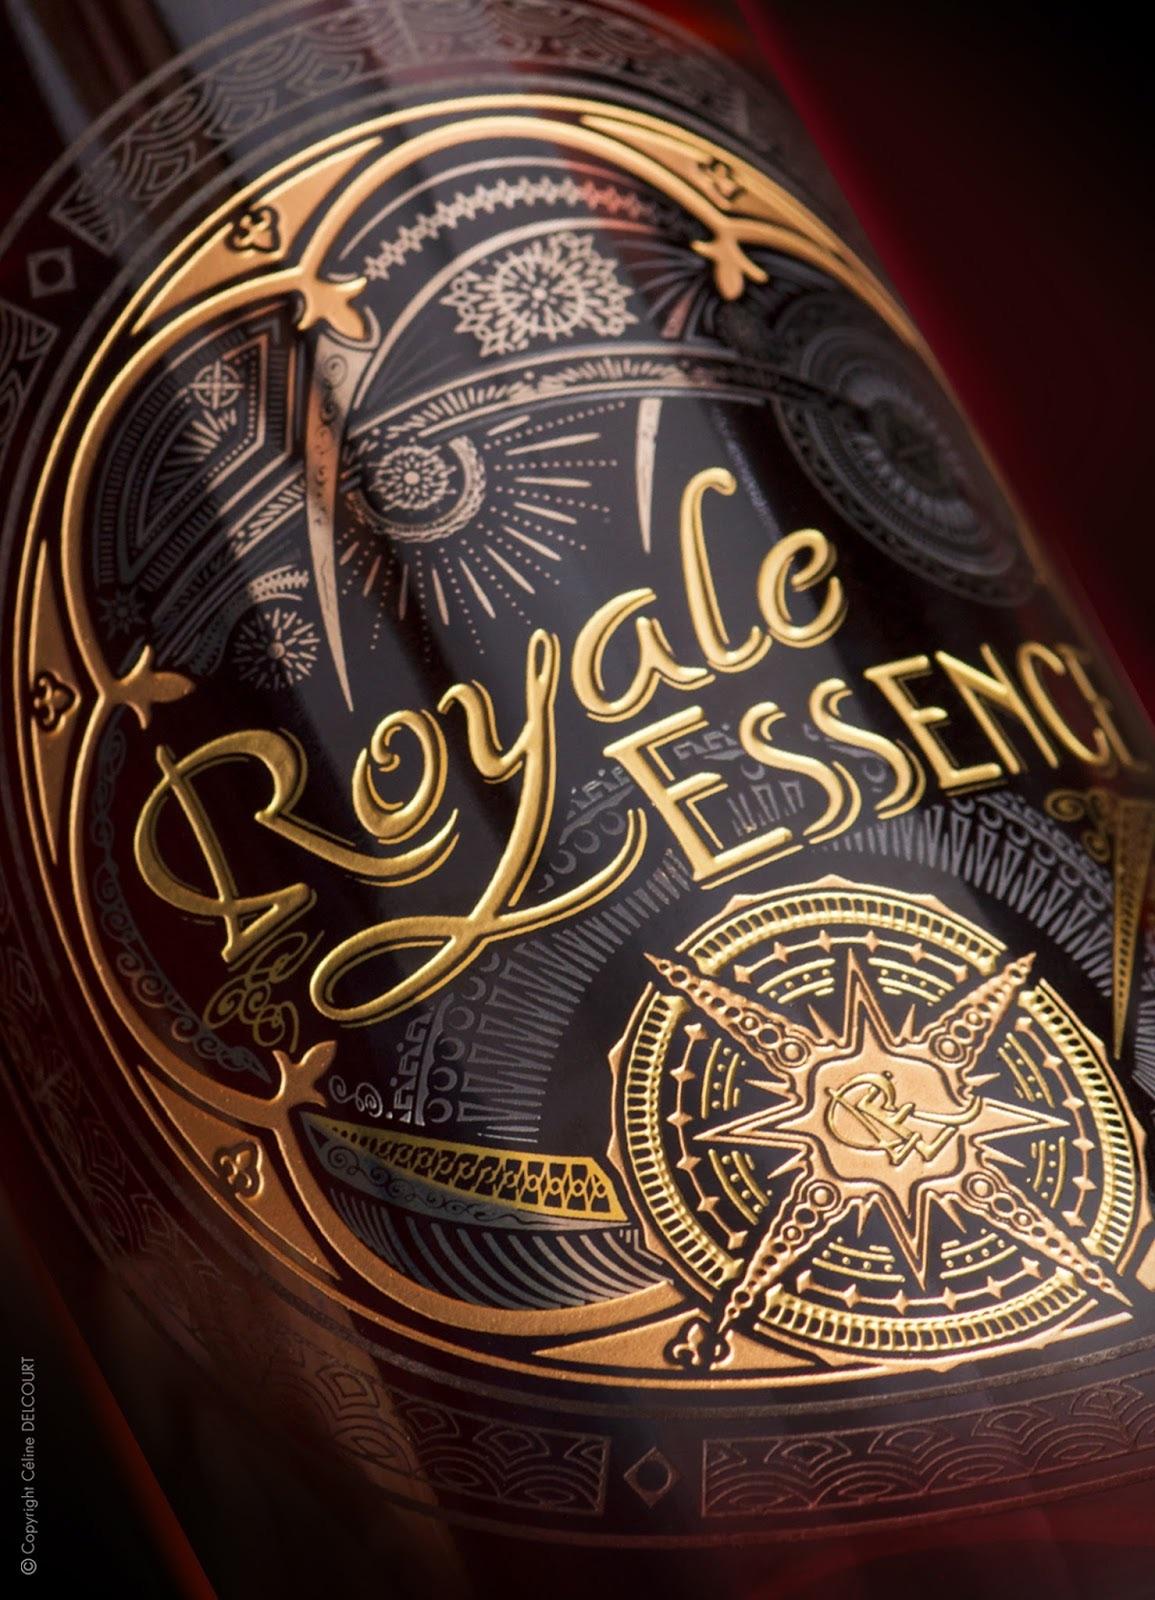 royale essence packaging2